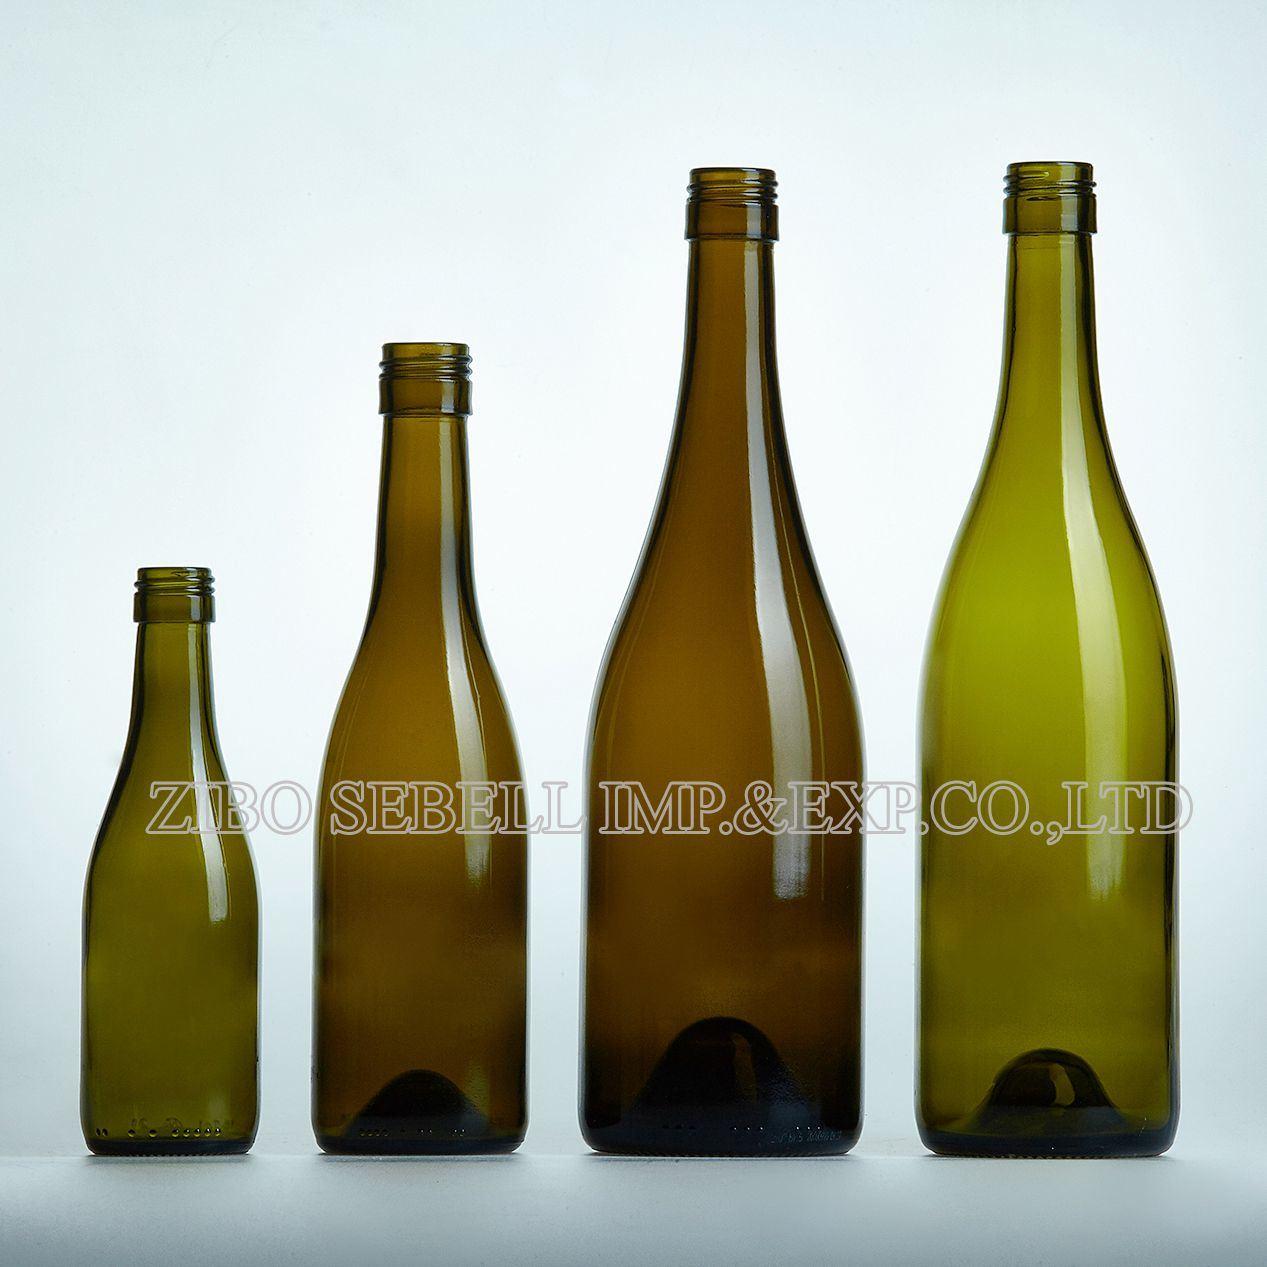 Burgundy Bvs Screwtop Antique Green Red Wine Glass Bottle (04-glass bottle)